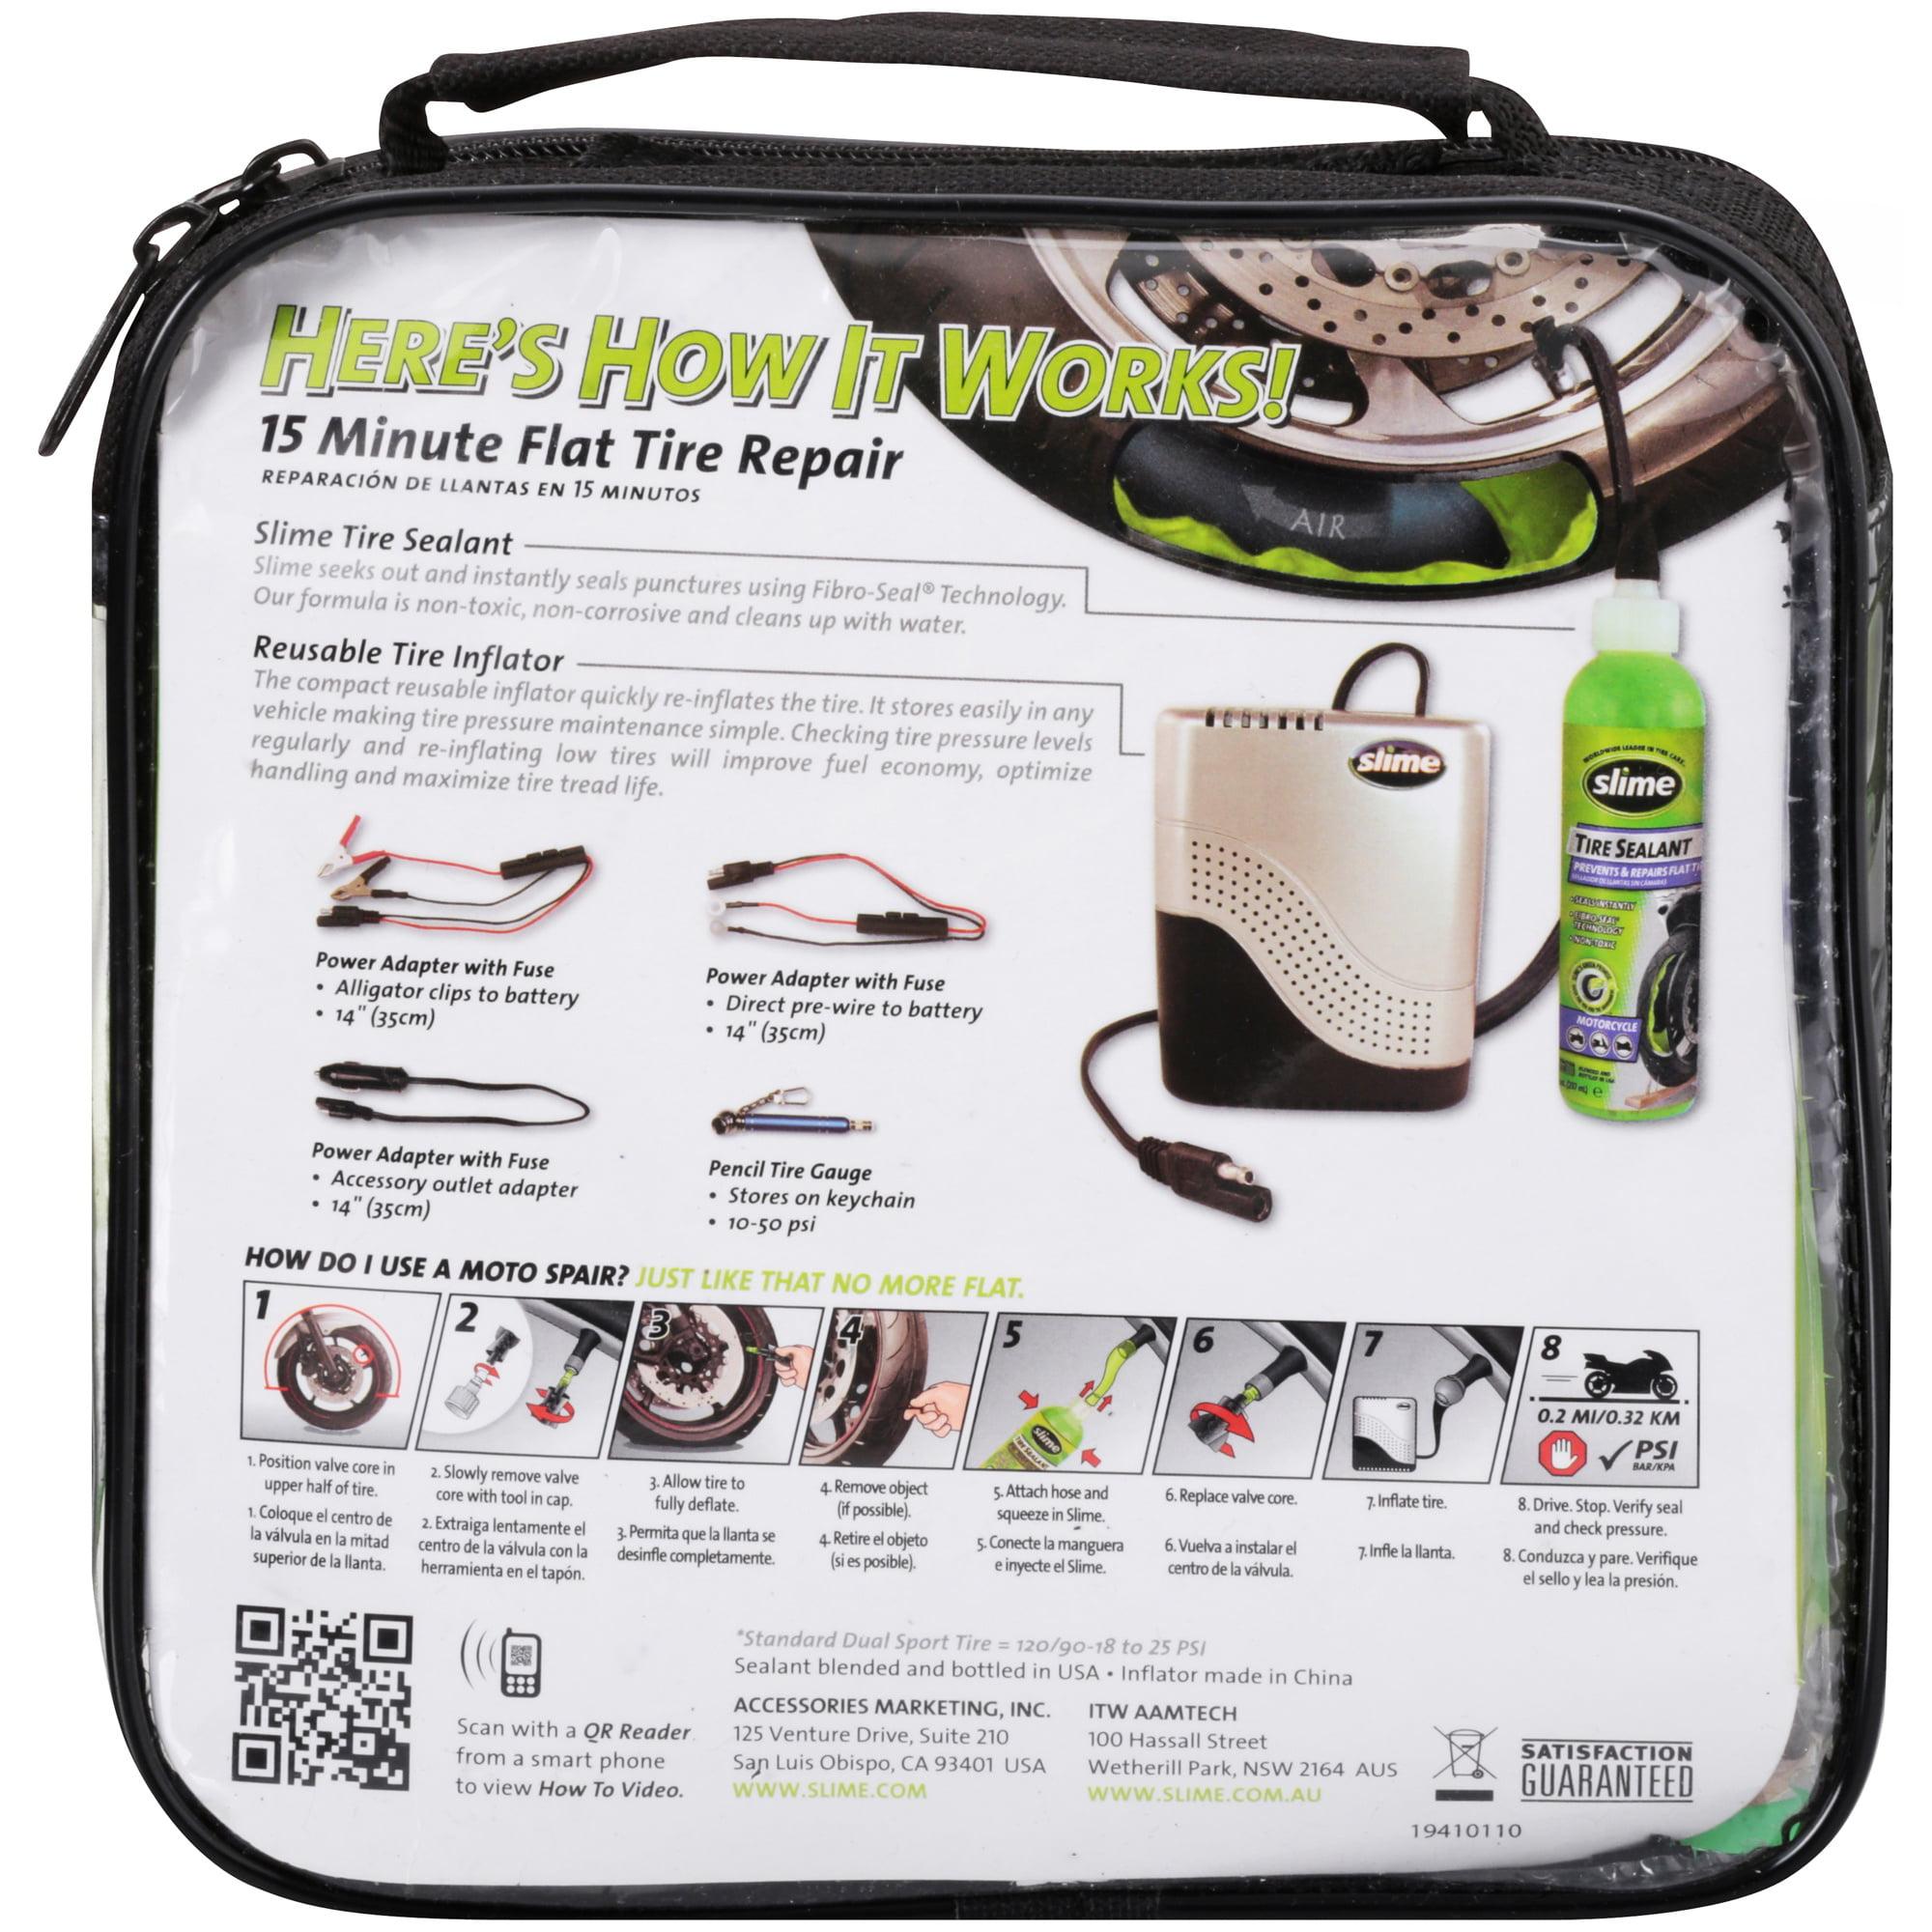 Slime® Moto Spair® Small Tire Emergency Flat Tire Repair Kit 6 pc Bag -  50001 - Walmart.com